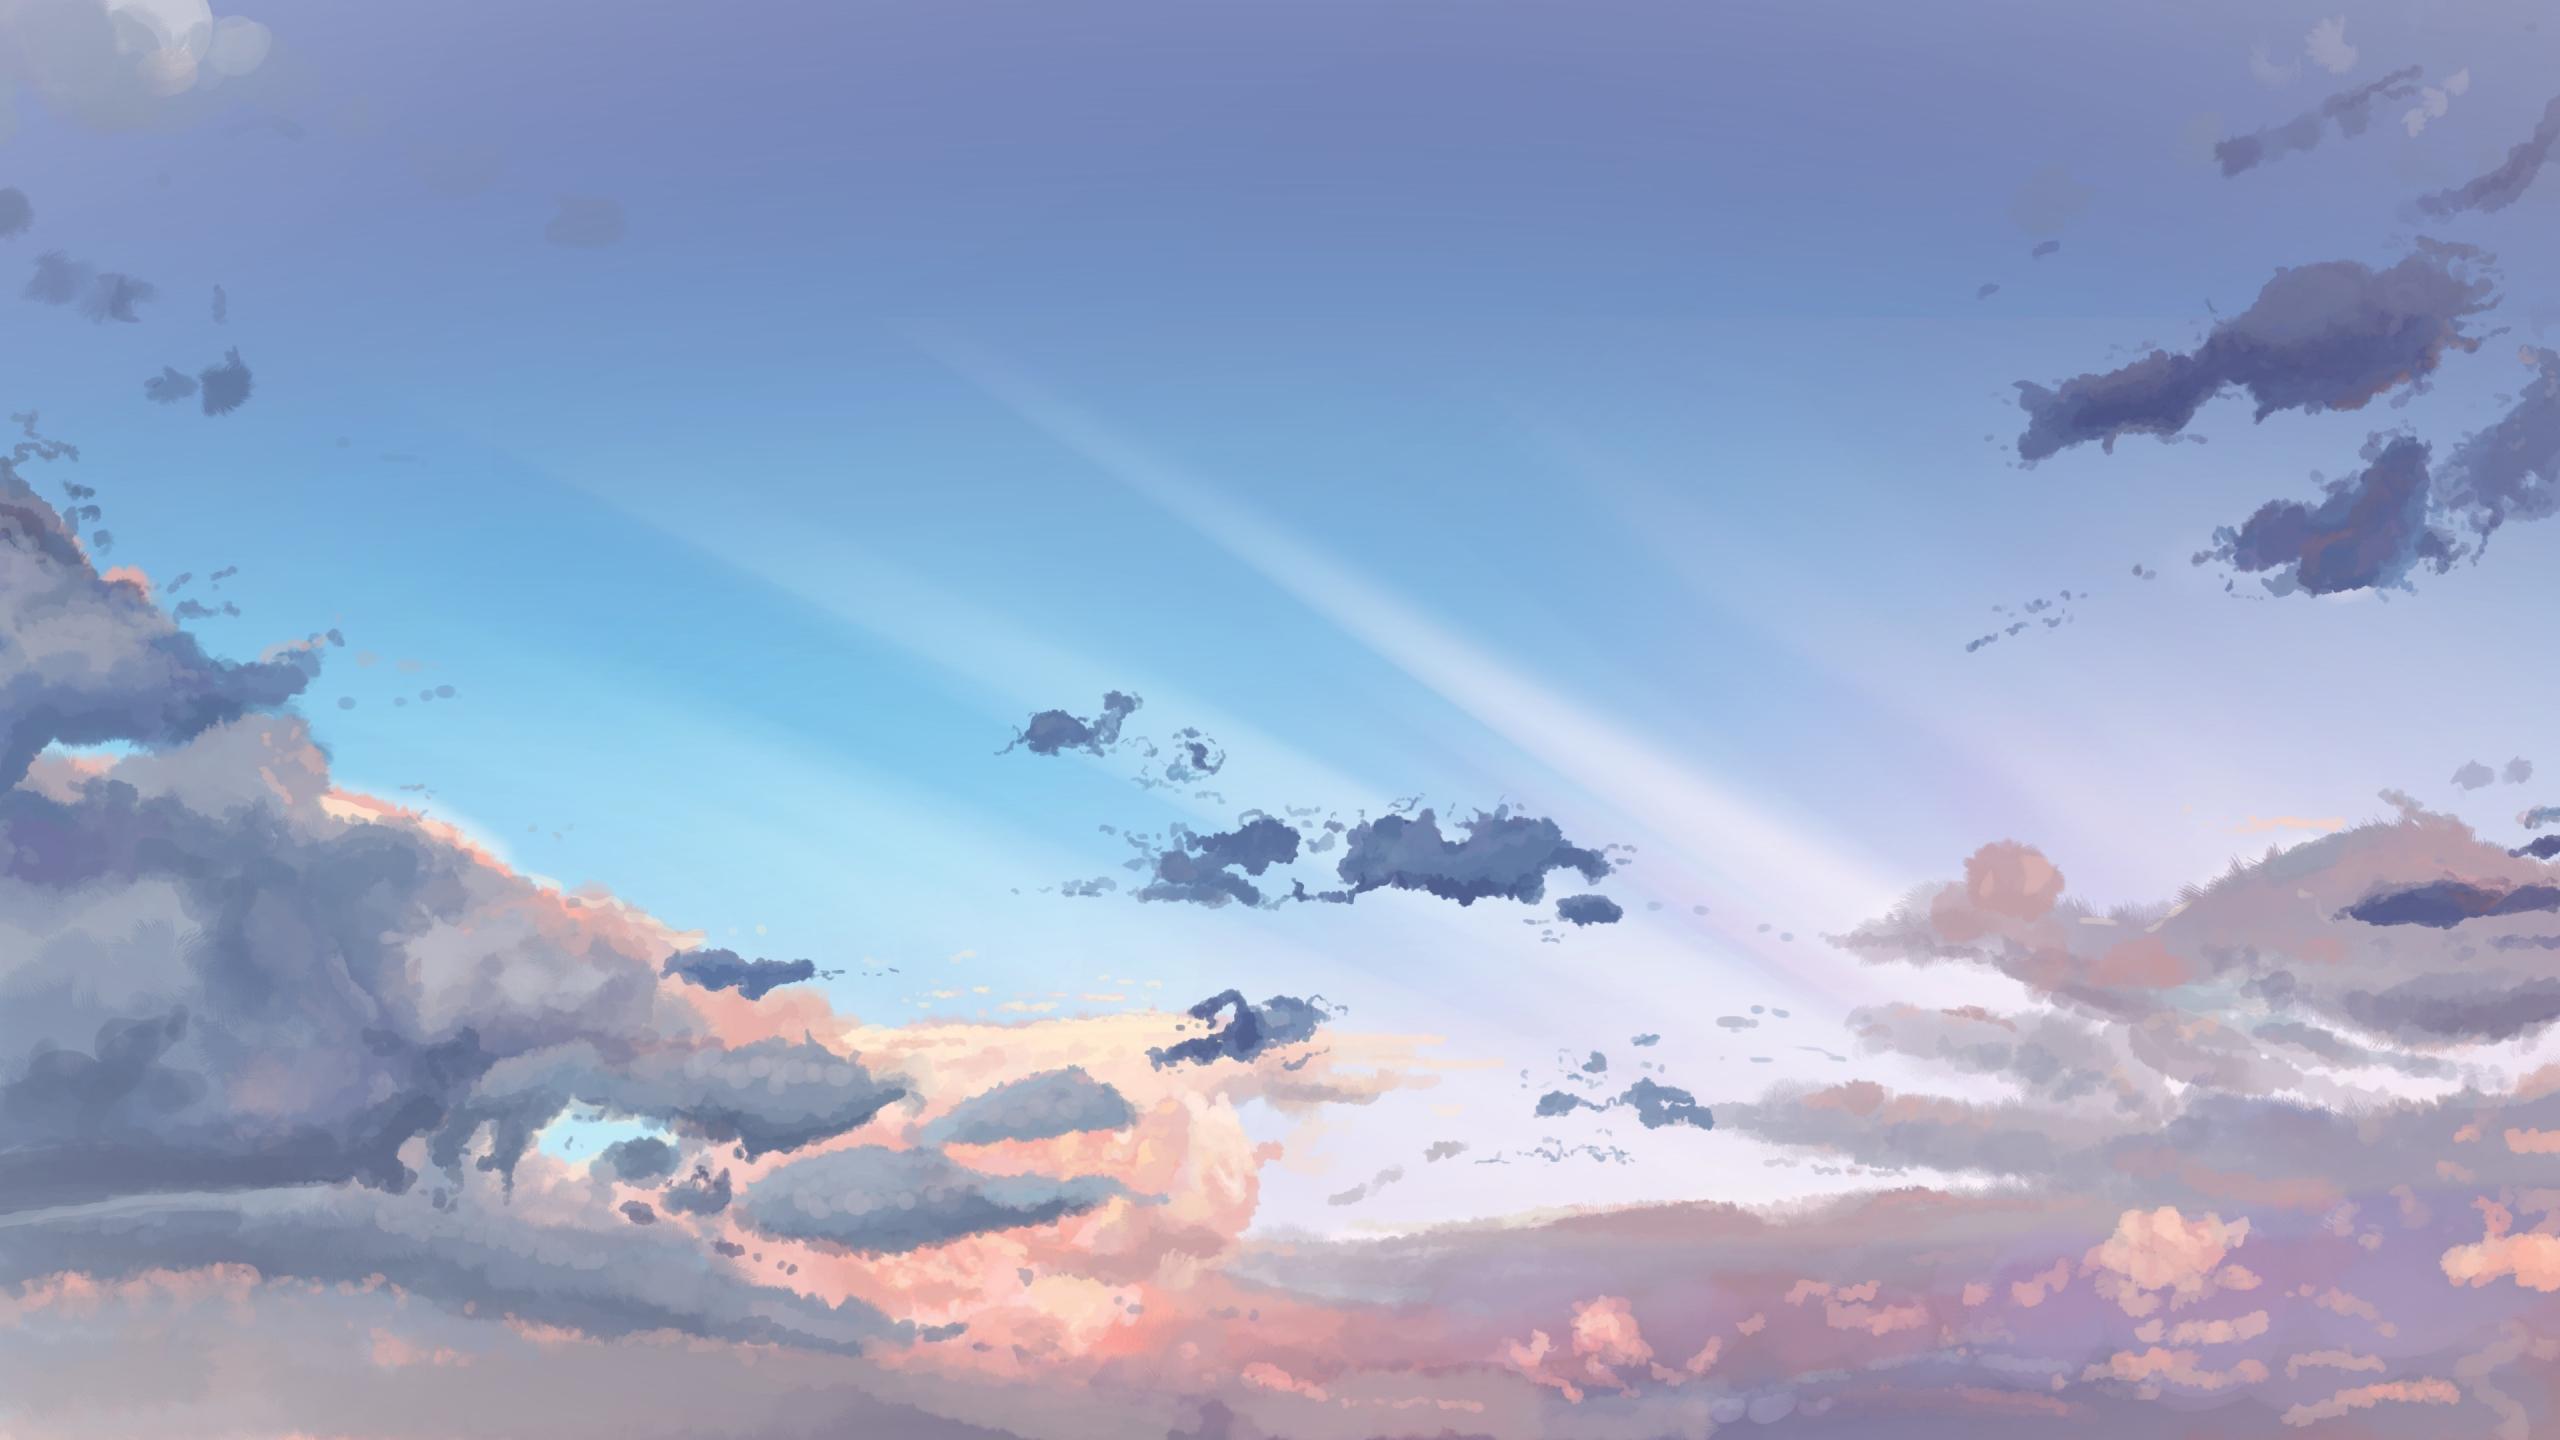 Download 2560x1440 Wallpaper Sky Clouds Original Anime Dual